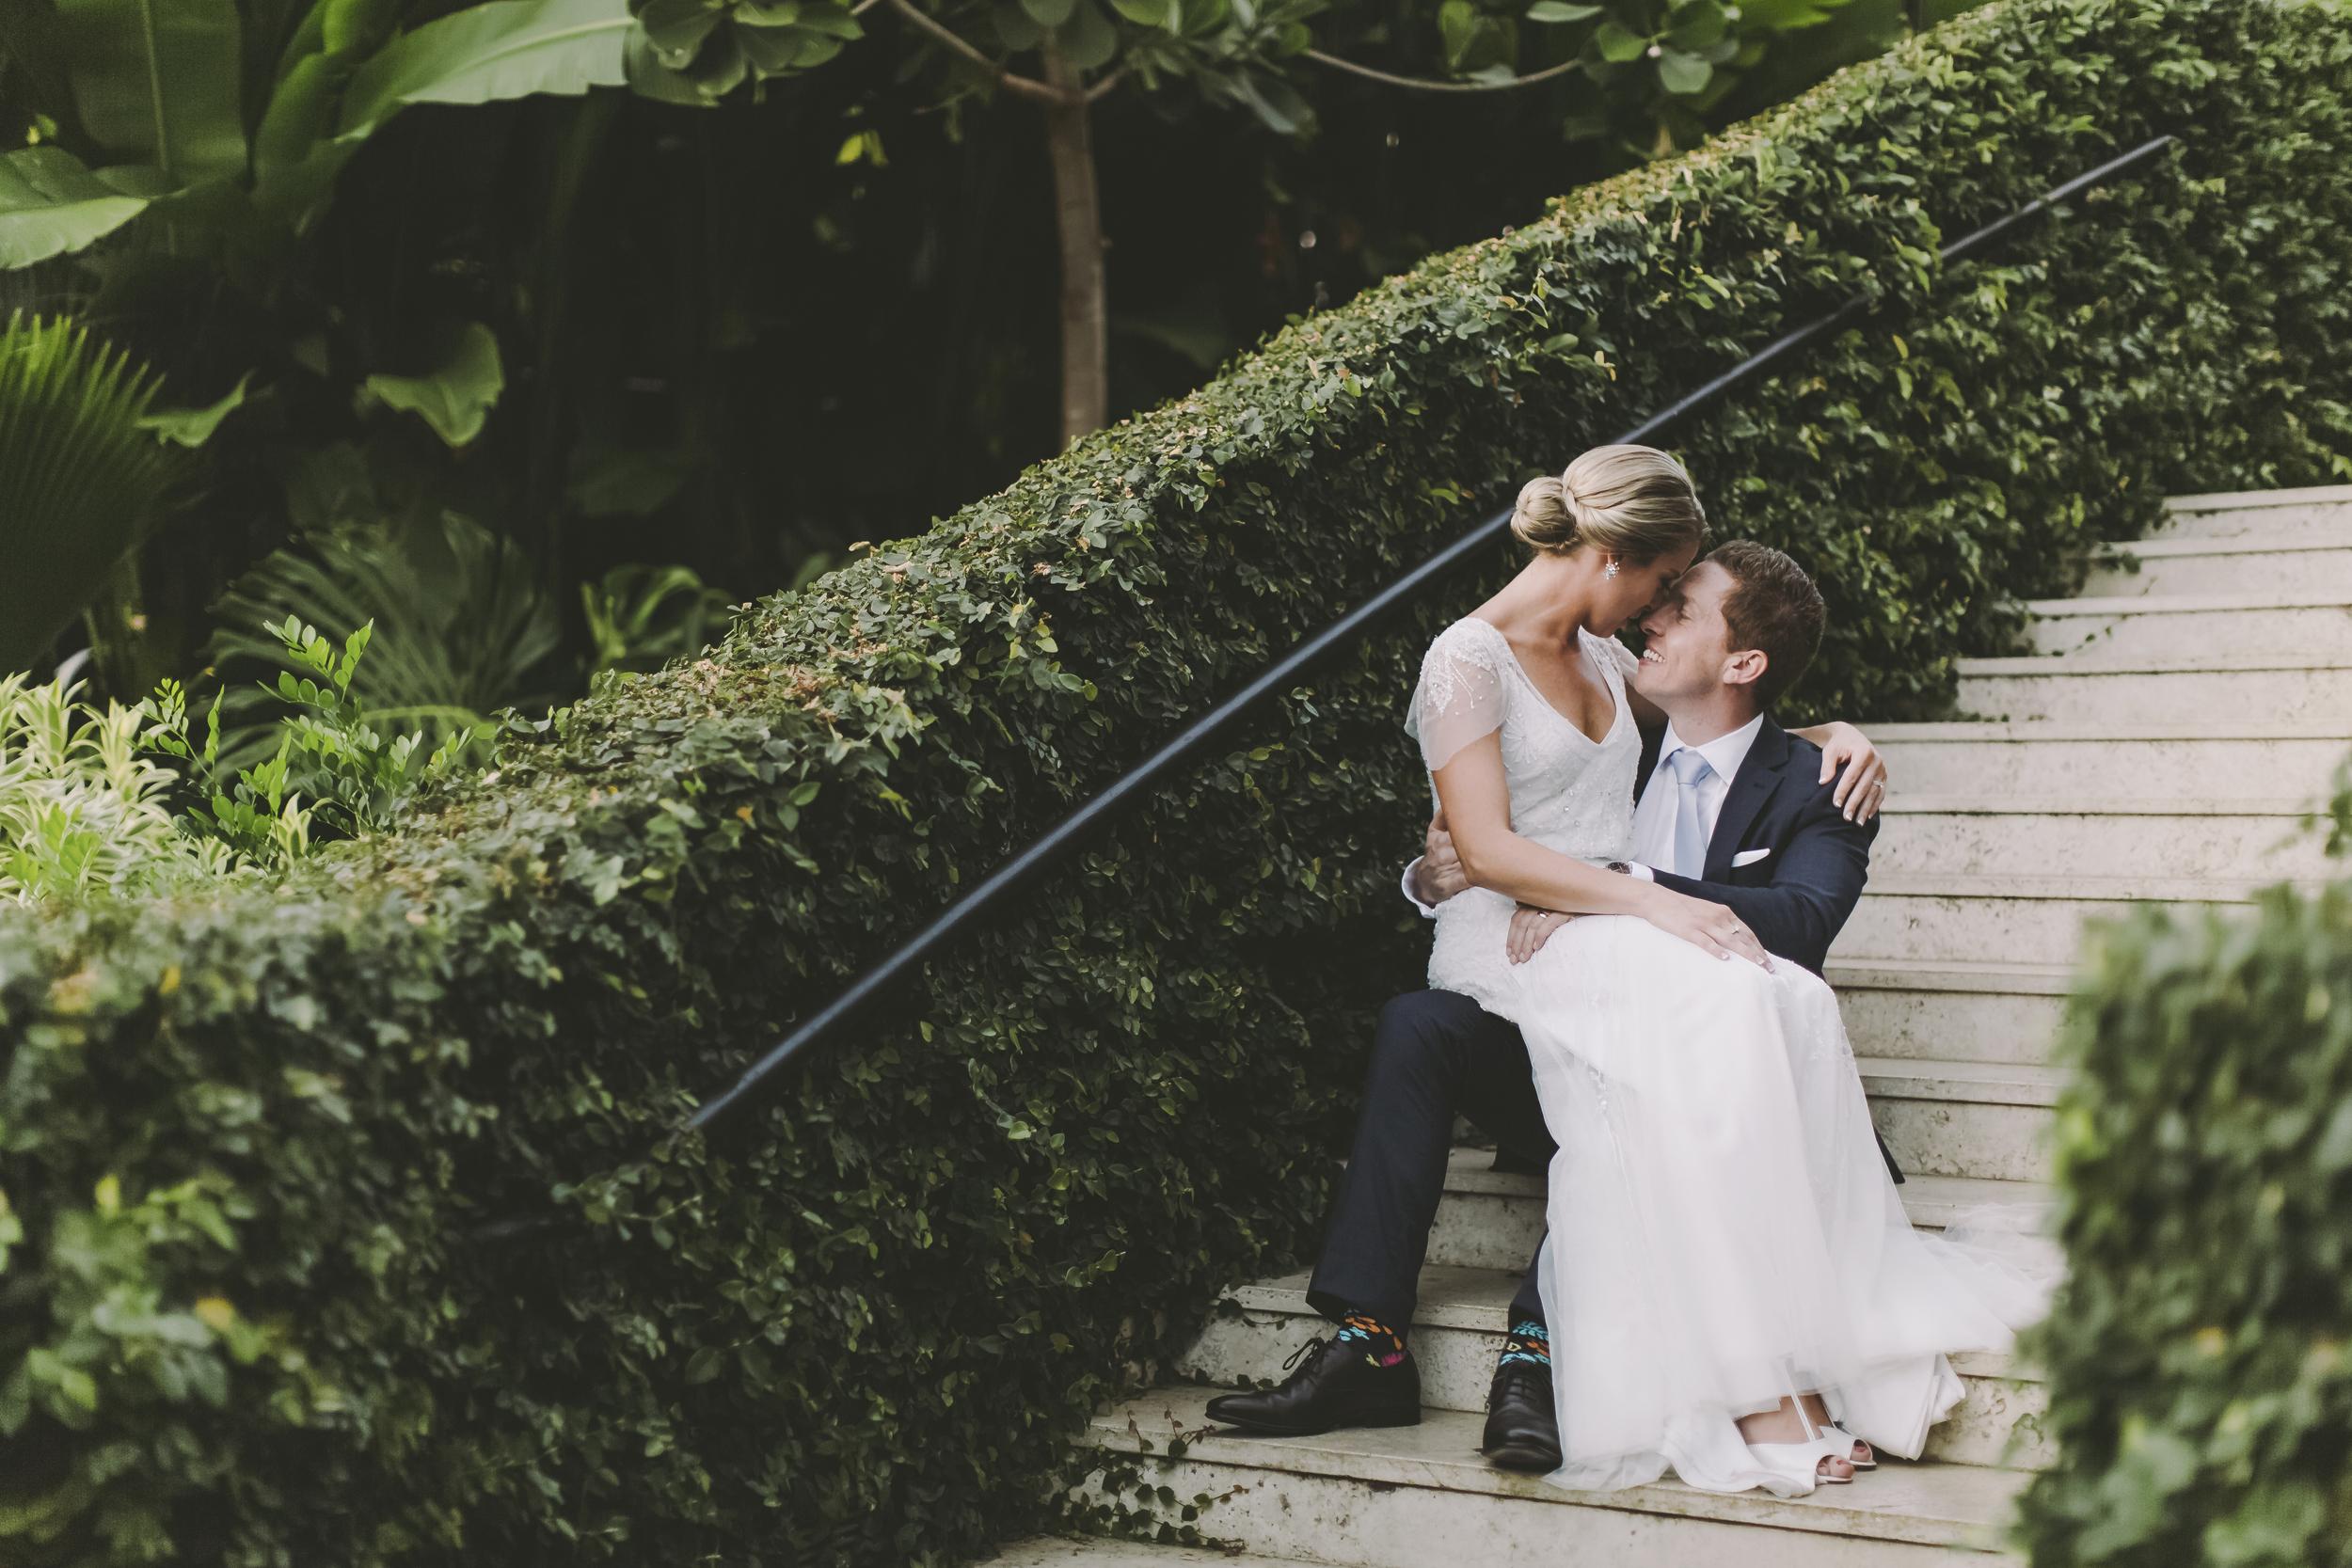 angie-diaz-photography-maui-wedding-mel-matt-92.jpg